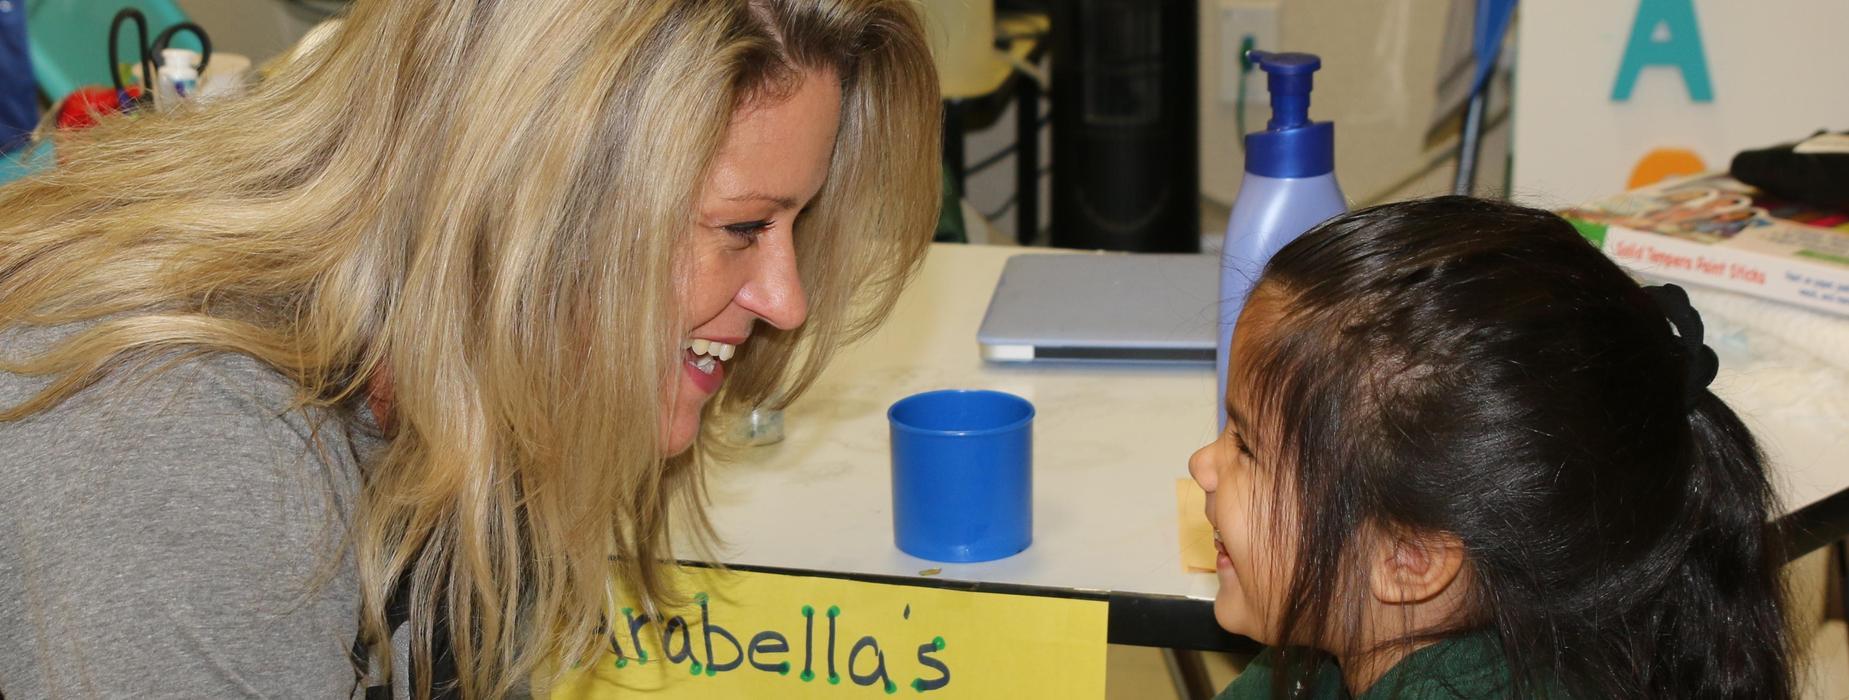 Principal and student smiling.